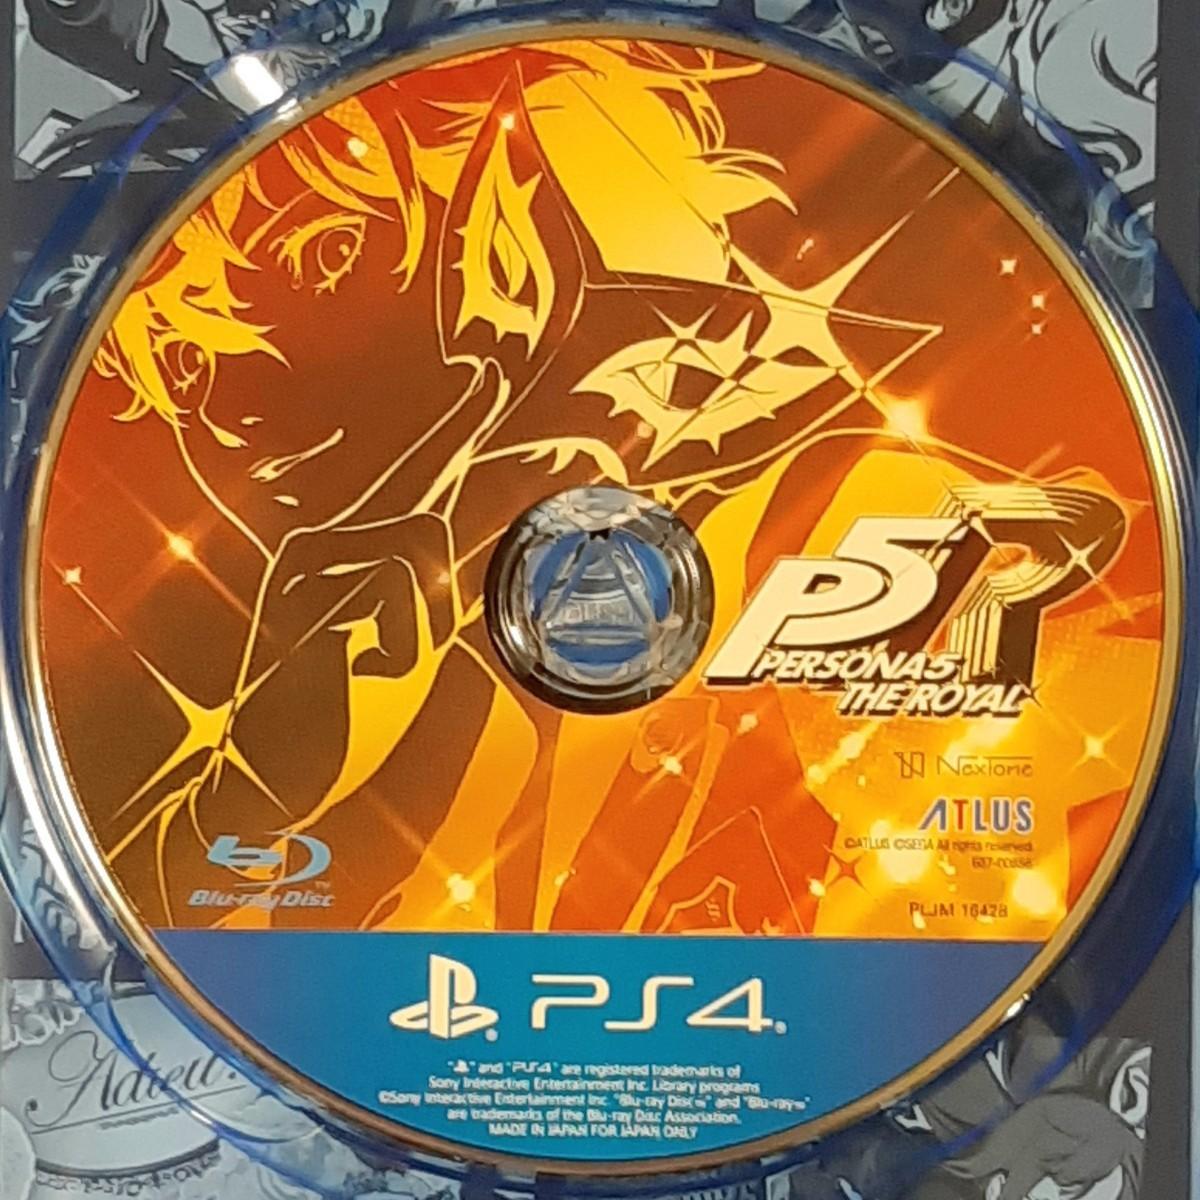 【PS4】 ペルソナ5 ザ・ロイヤル [通常版]  PERSONA5 THE ROYAL